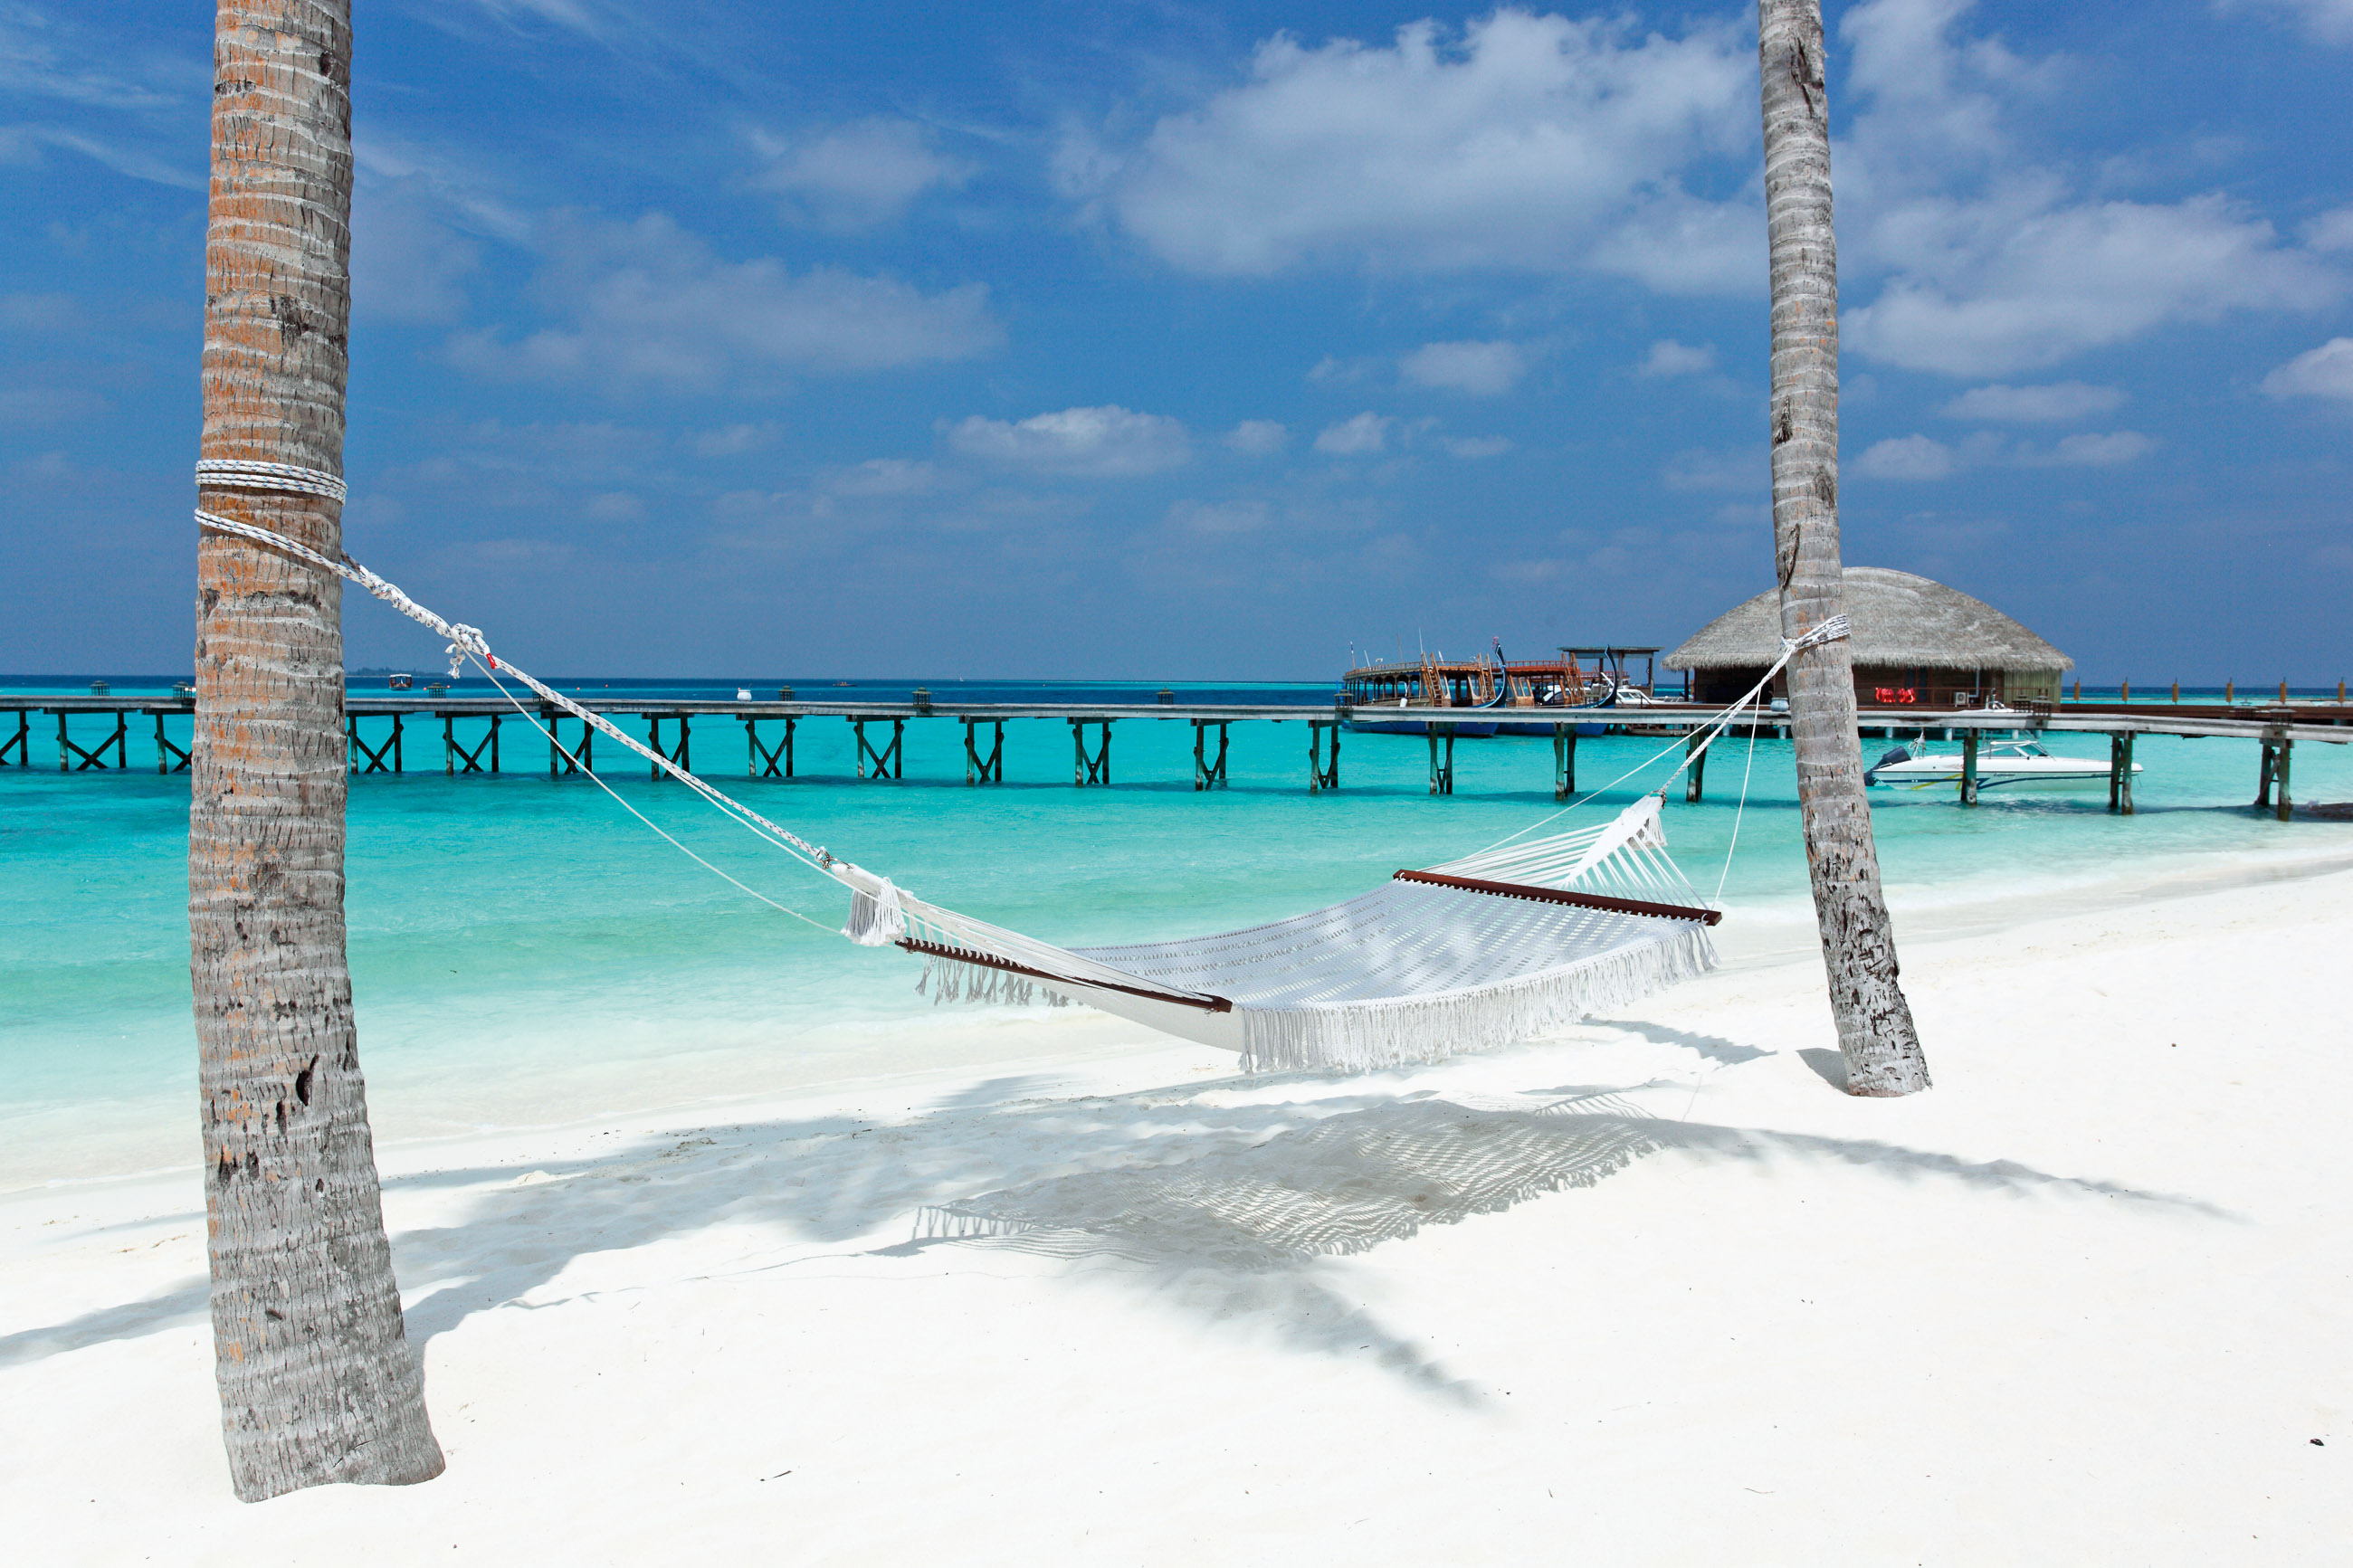 https://bubo.sk/uploads/galleries/16372/halaveli-maldives-beach-view-15_hd-29.jpg